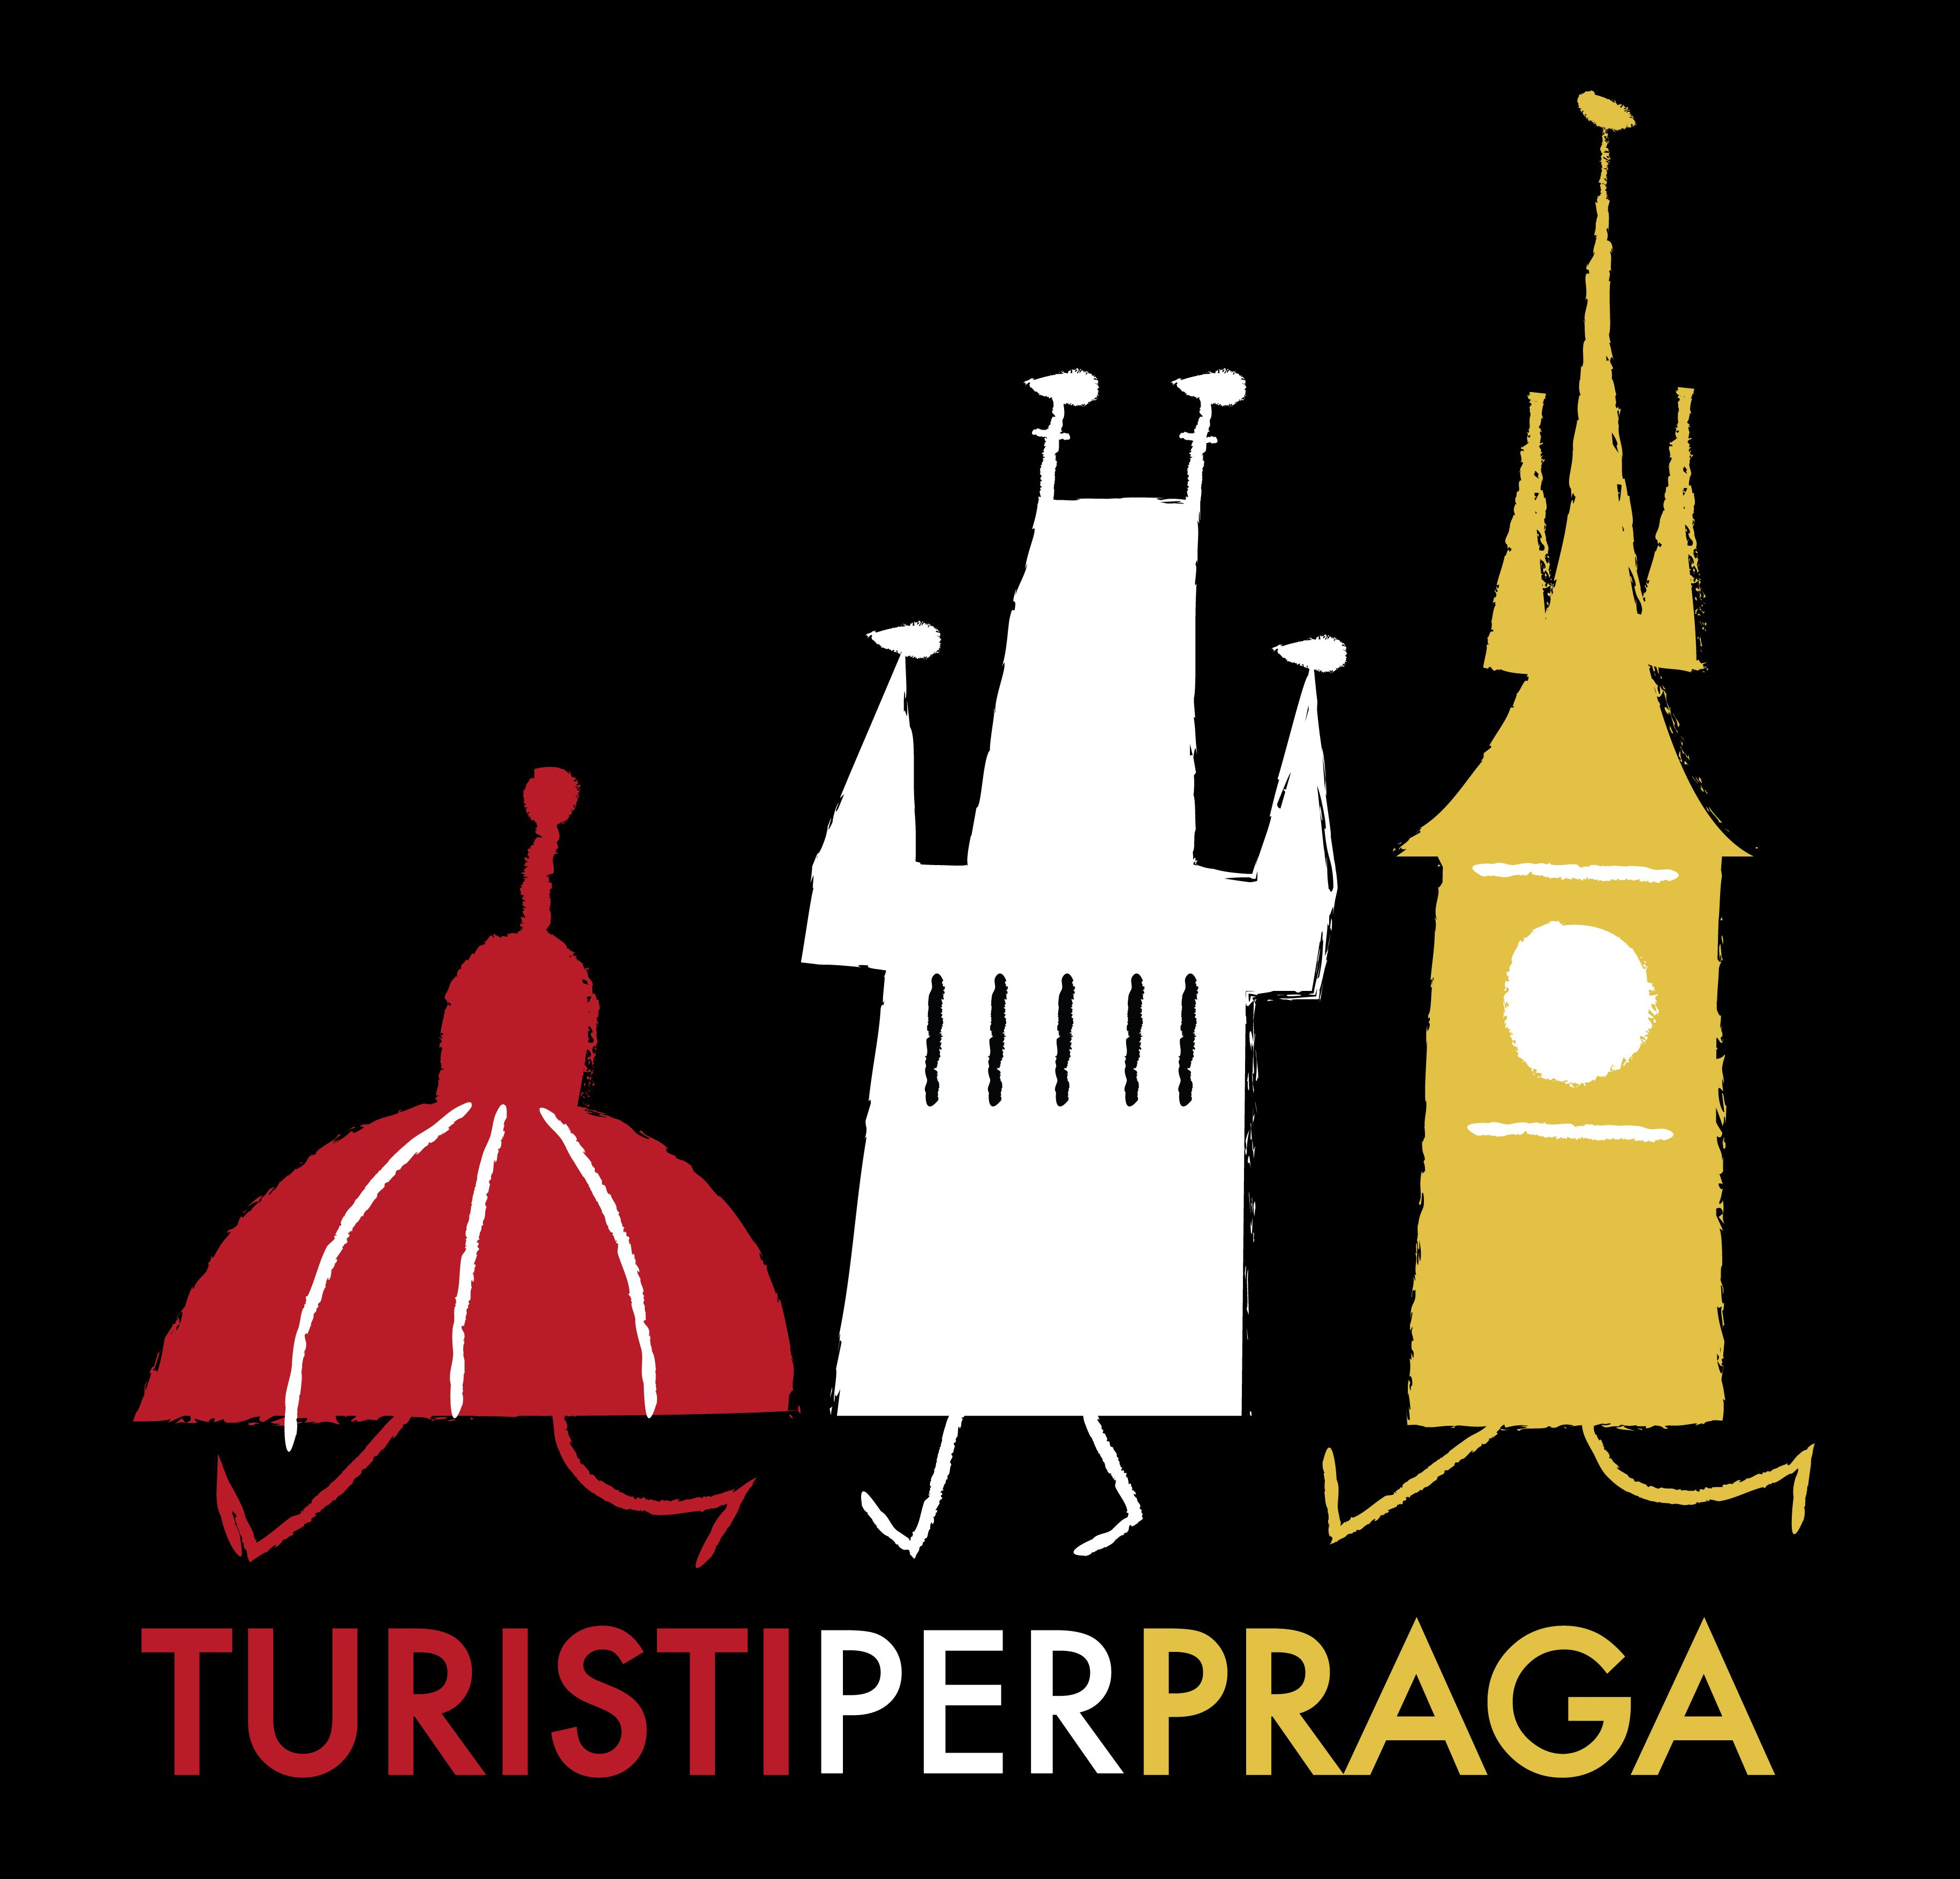 Scoprire i segreti di #Praga con Turisti Per Praga #inviaggioconlilly2015 #prague #praha #travel http://lillyslifestyle.com/2015/09/03/scoprire-i-segreti-di-praga-con-turisti-per-praga/